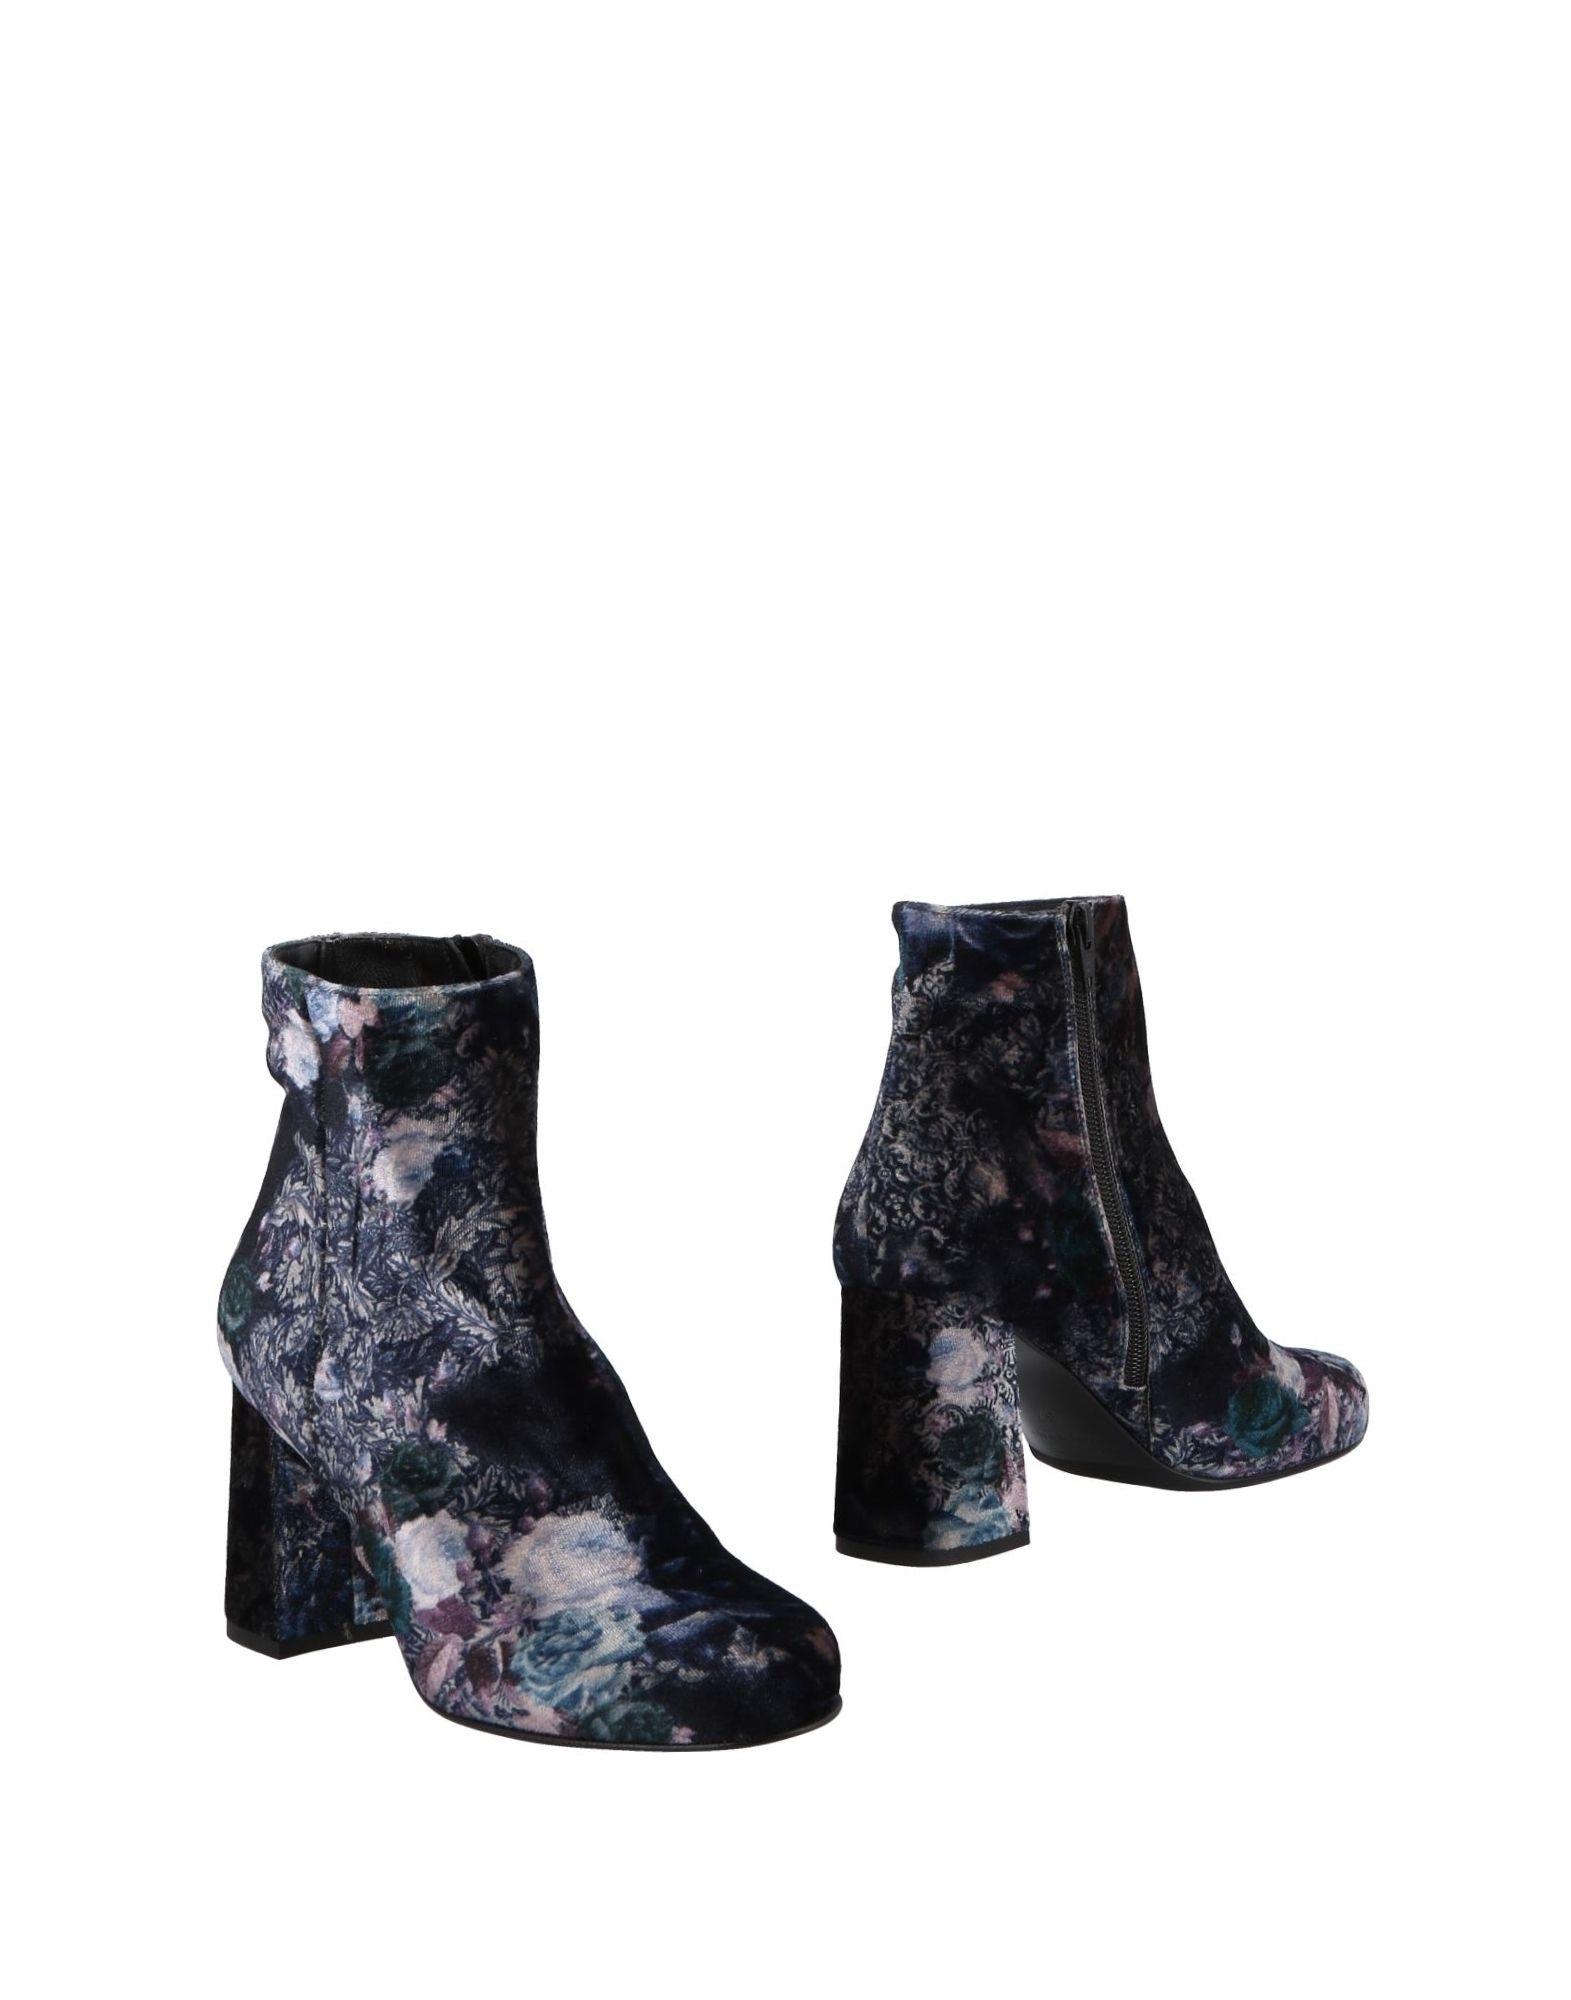 Tatoo Tatoo Tatoo Ankle Boot - Women Tatoo Ankle Boots online on  United Kingdom - 11498870NS 20fcd5